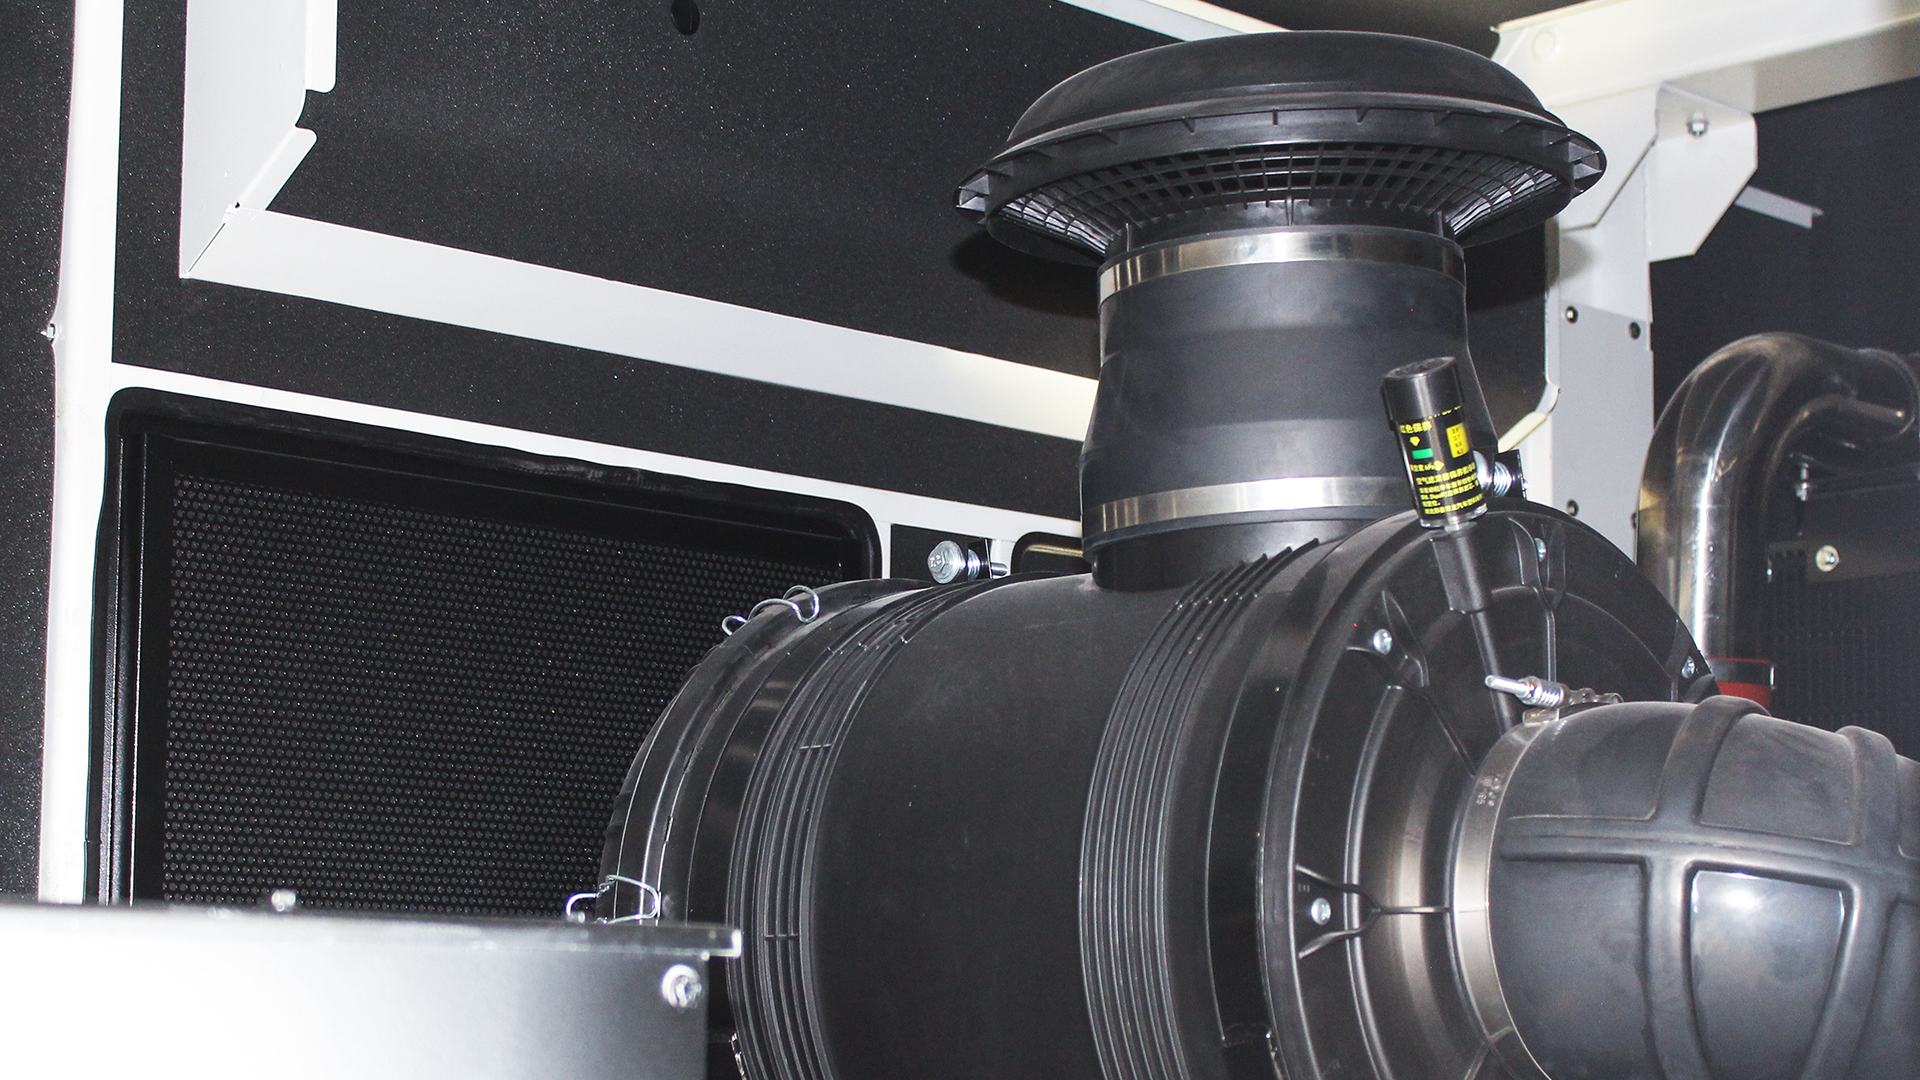 Turbo Charger pressure gauge on Cummins genset engine